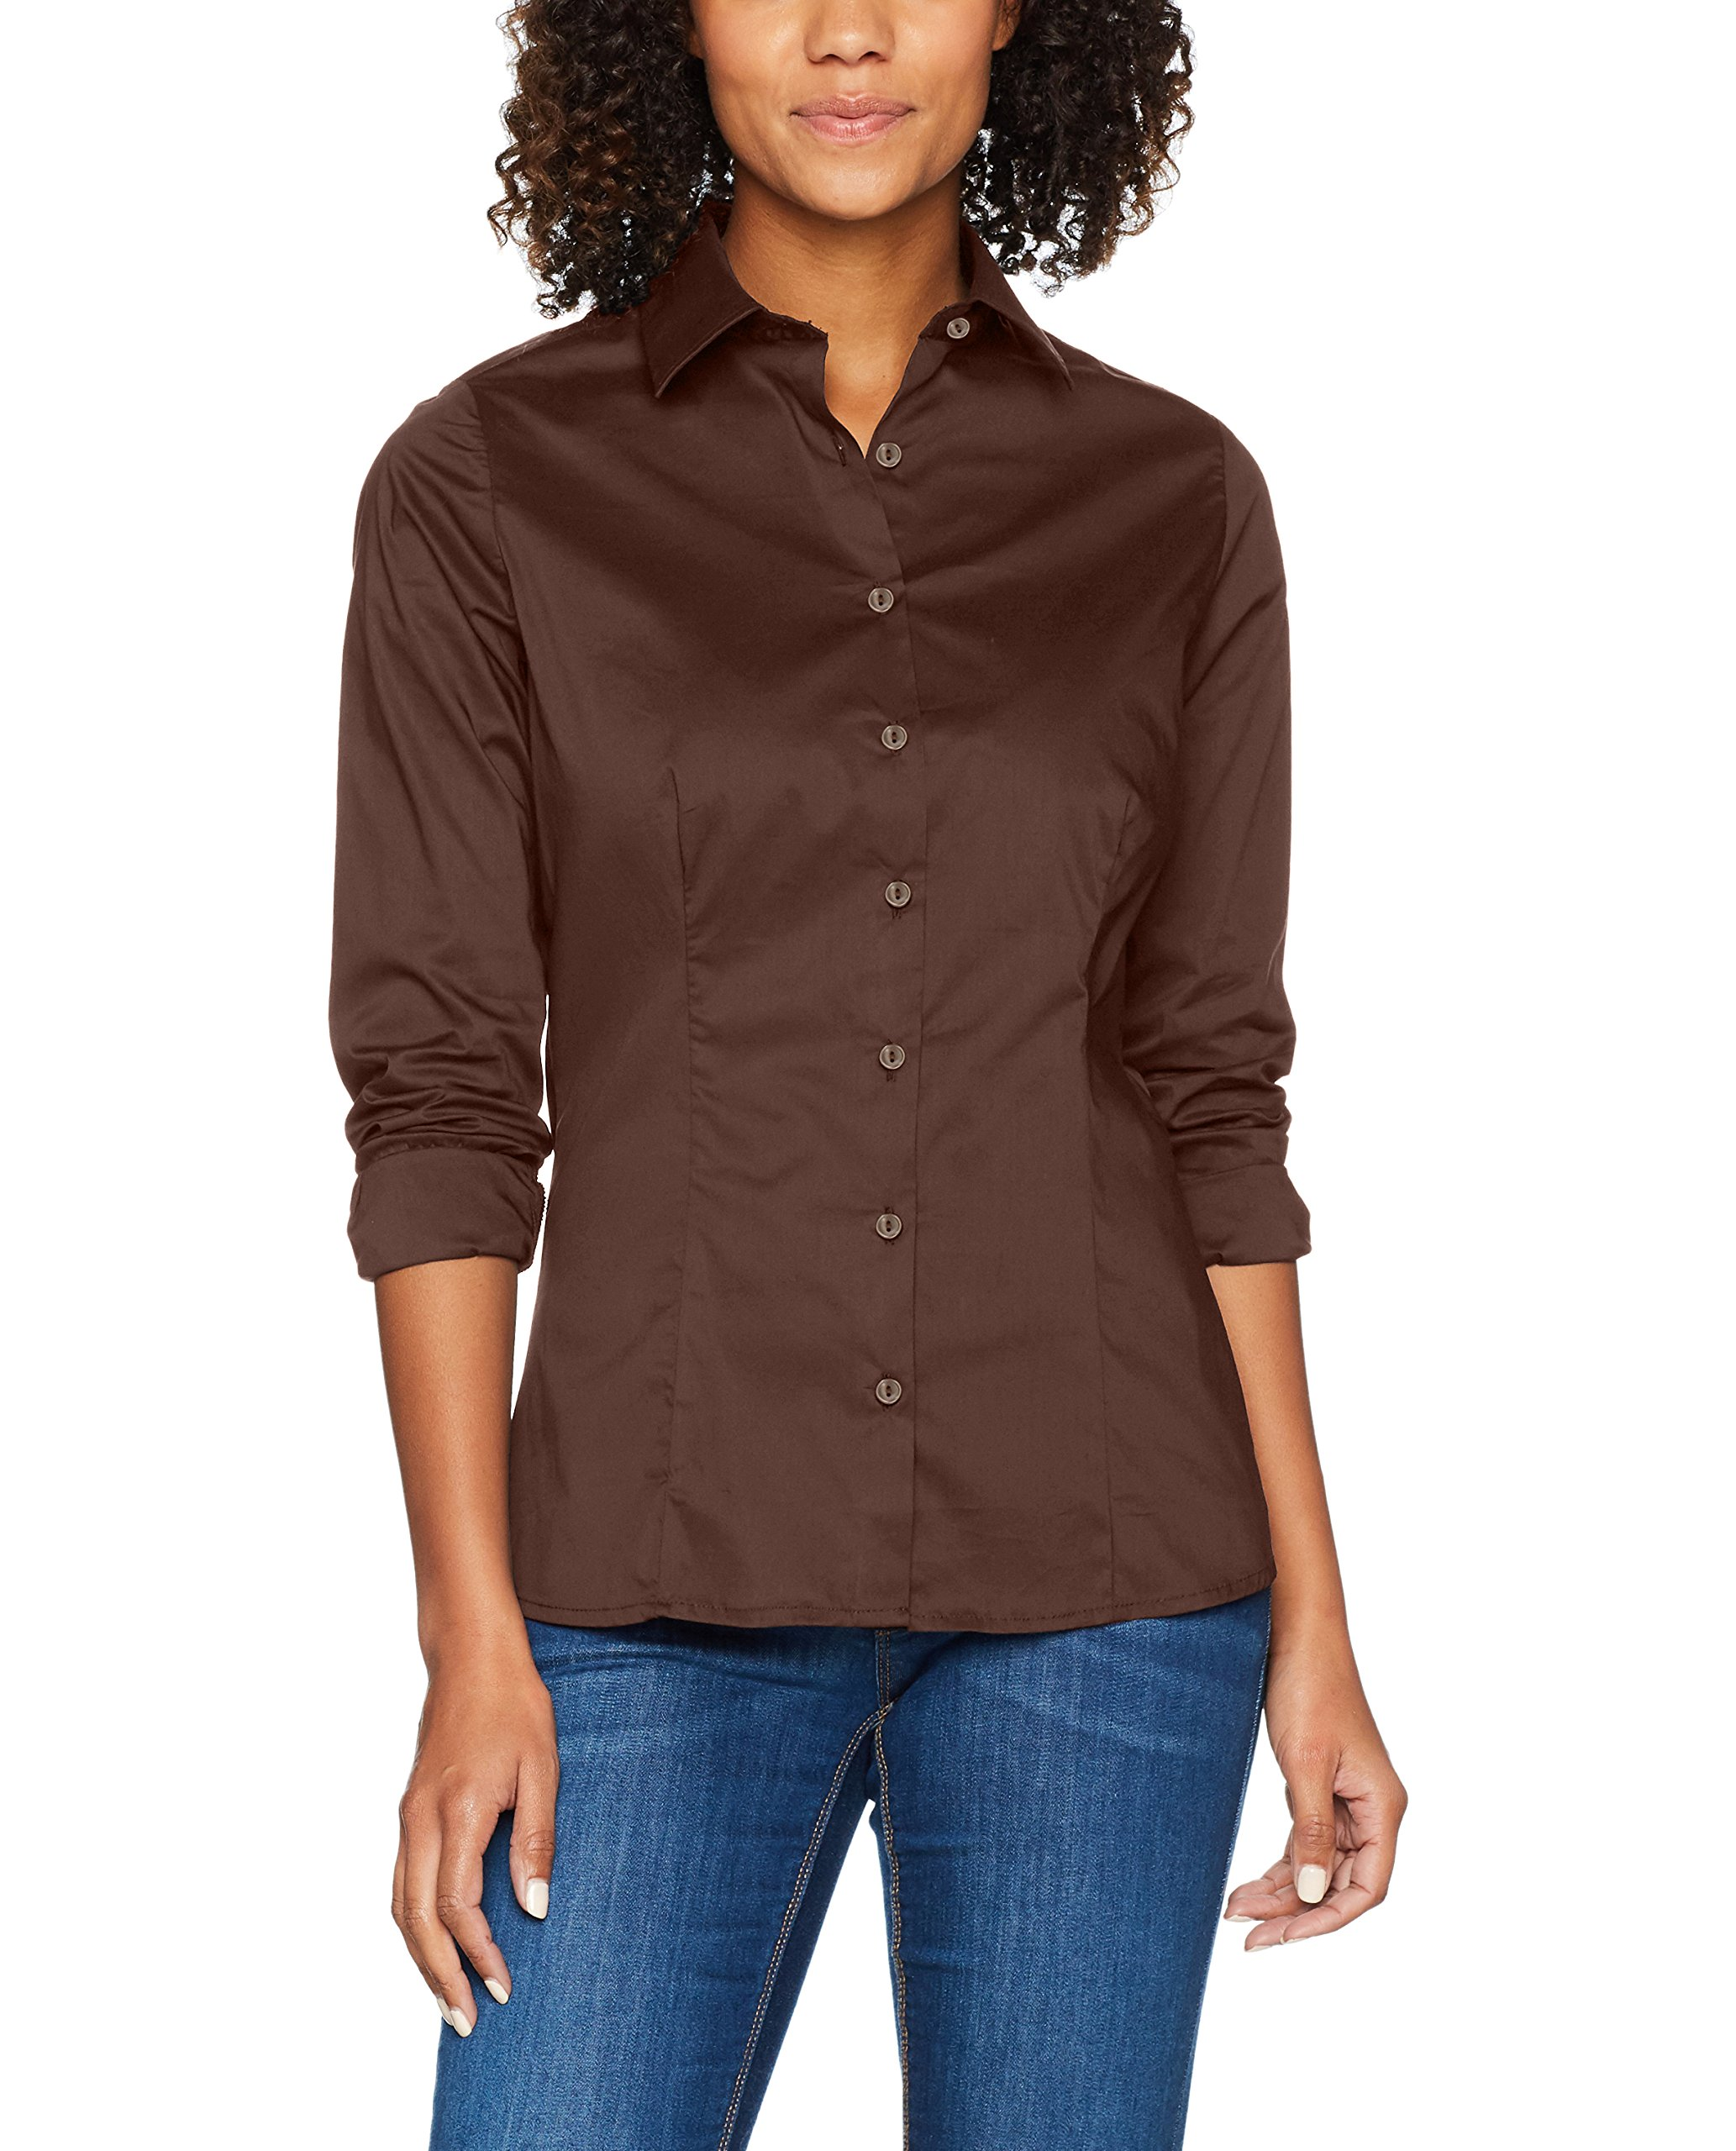 FabricantSmallFemme Nicholson Fit Jamesamp; Brown36taille BlouseMarron Ladies`shirt Du Slim FKJ1l3Tc